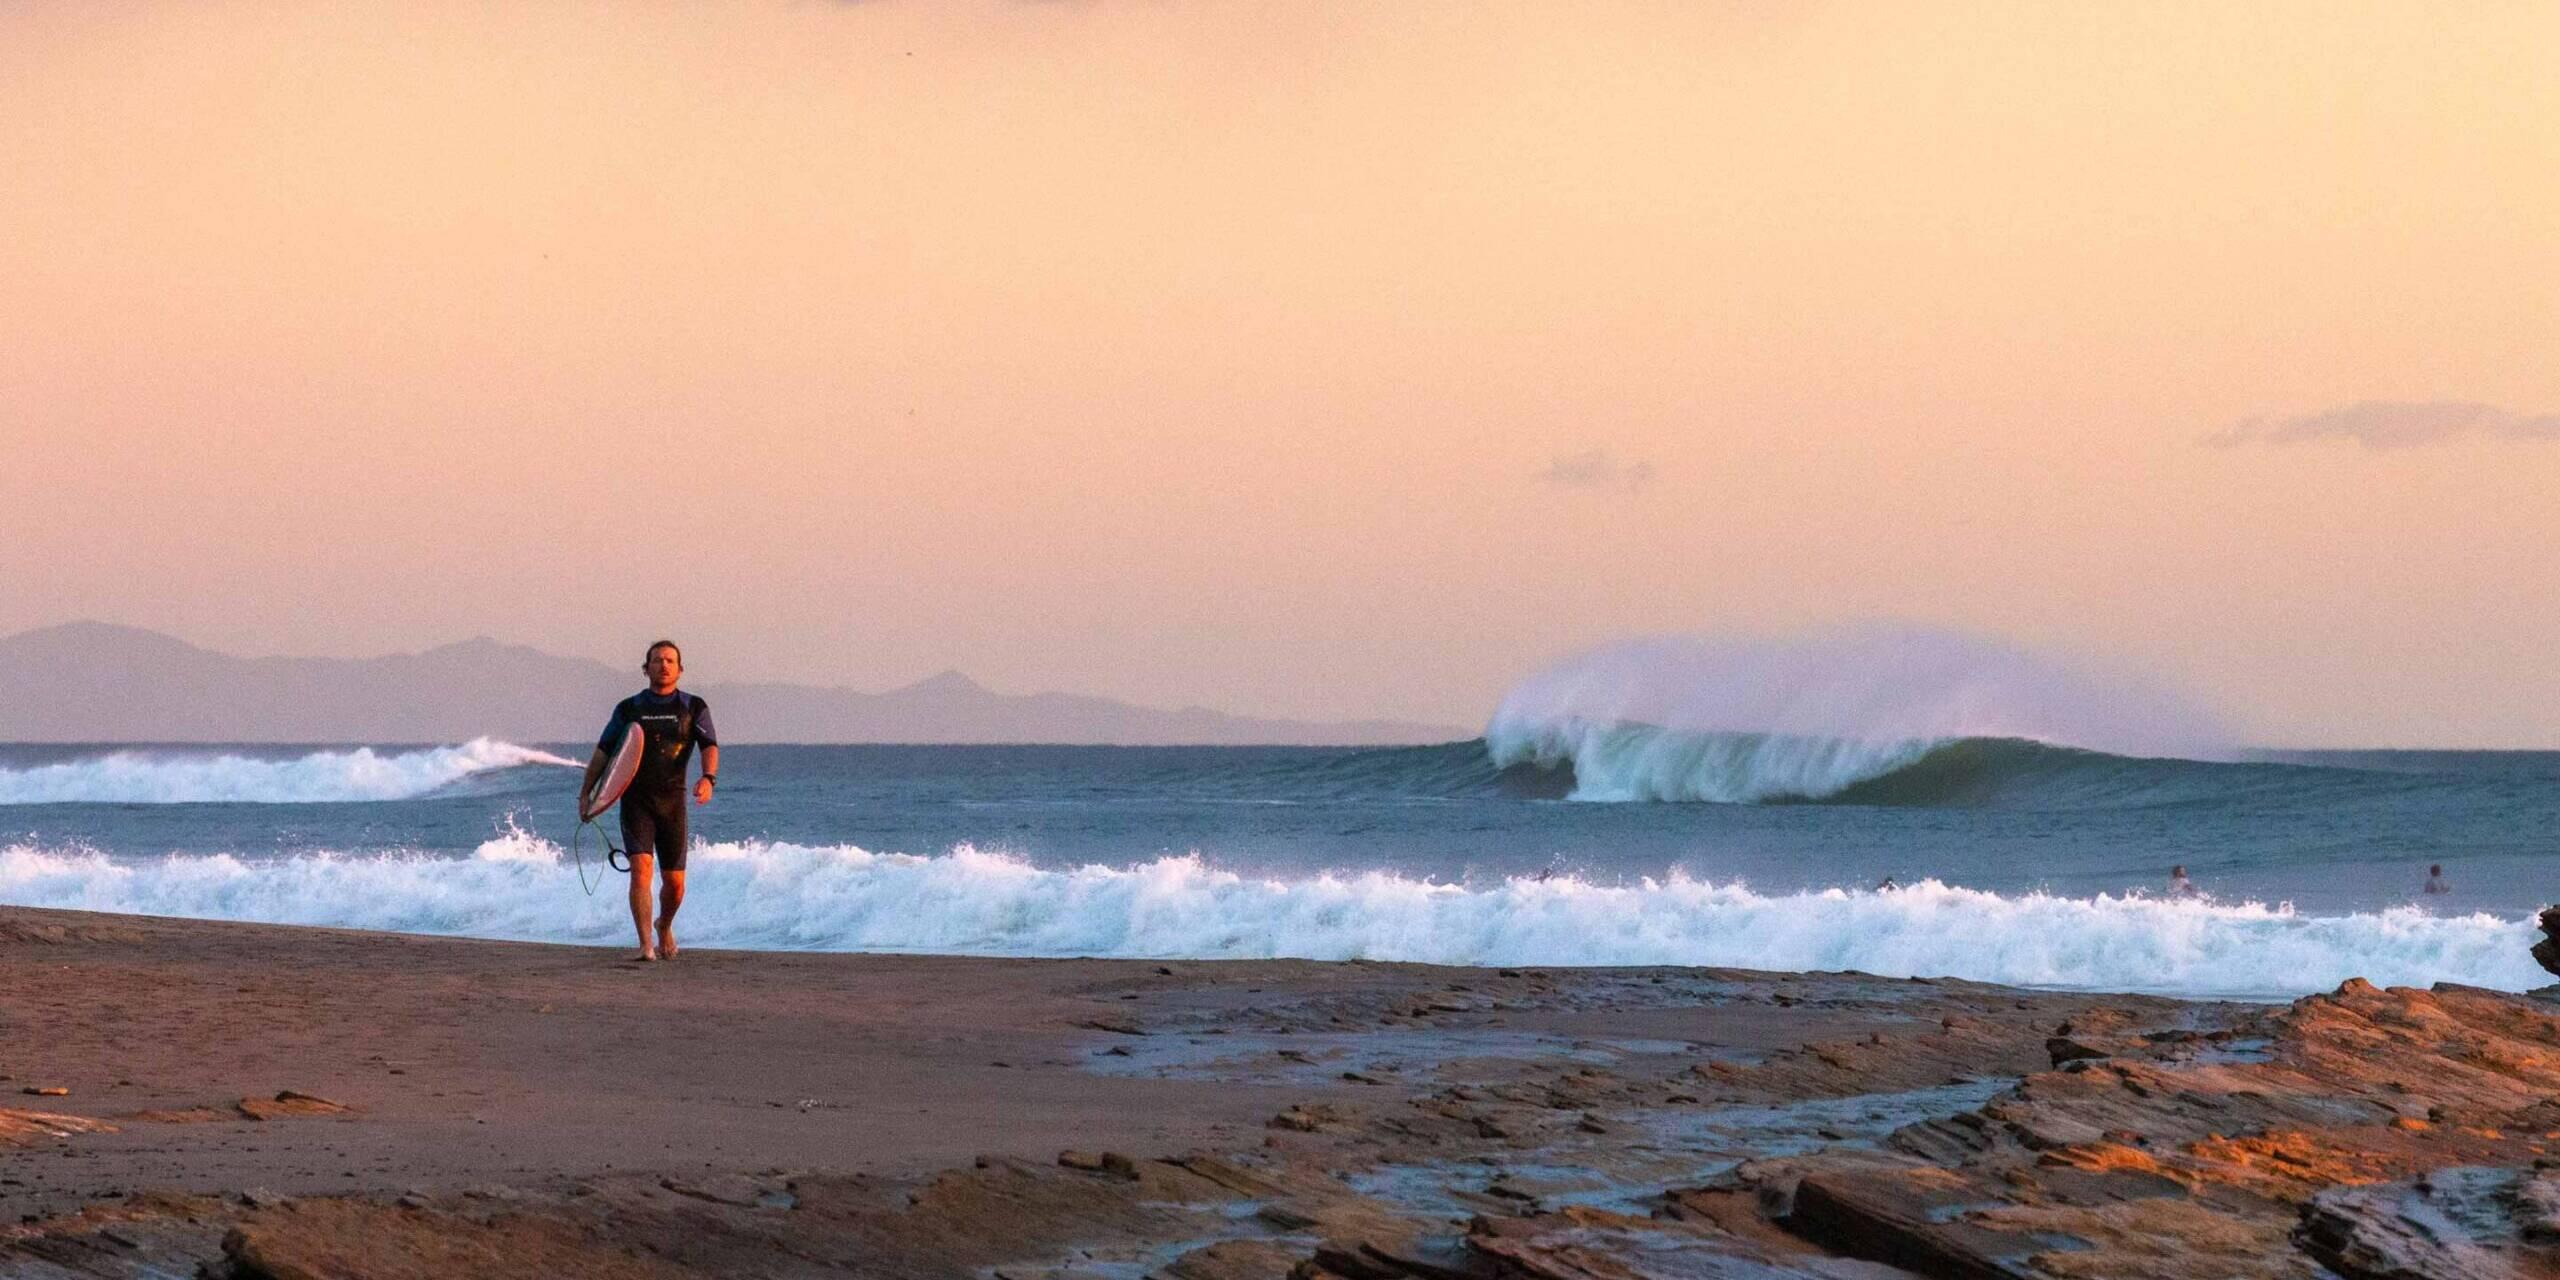 Surfer during sunset at Playa Popoyo Nicaragua